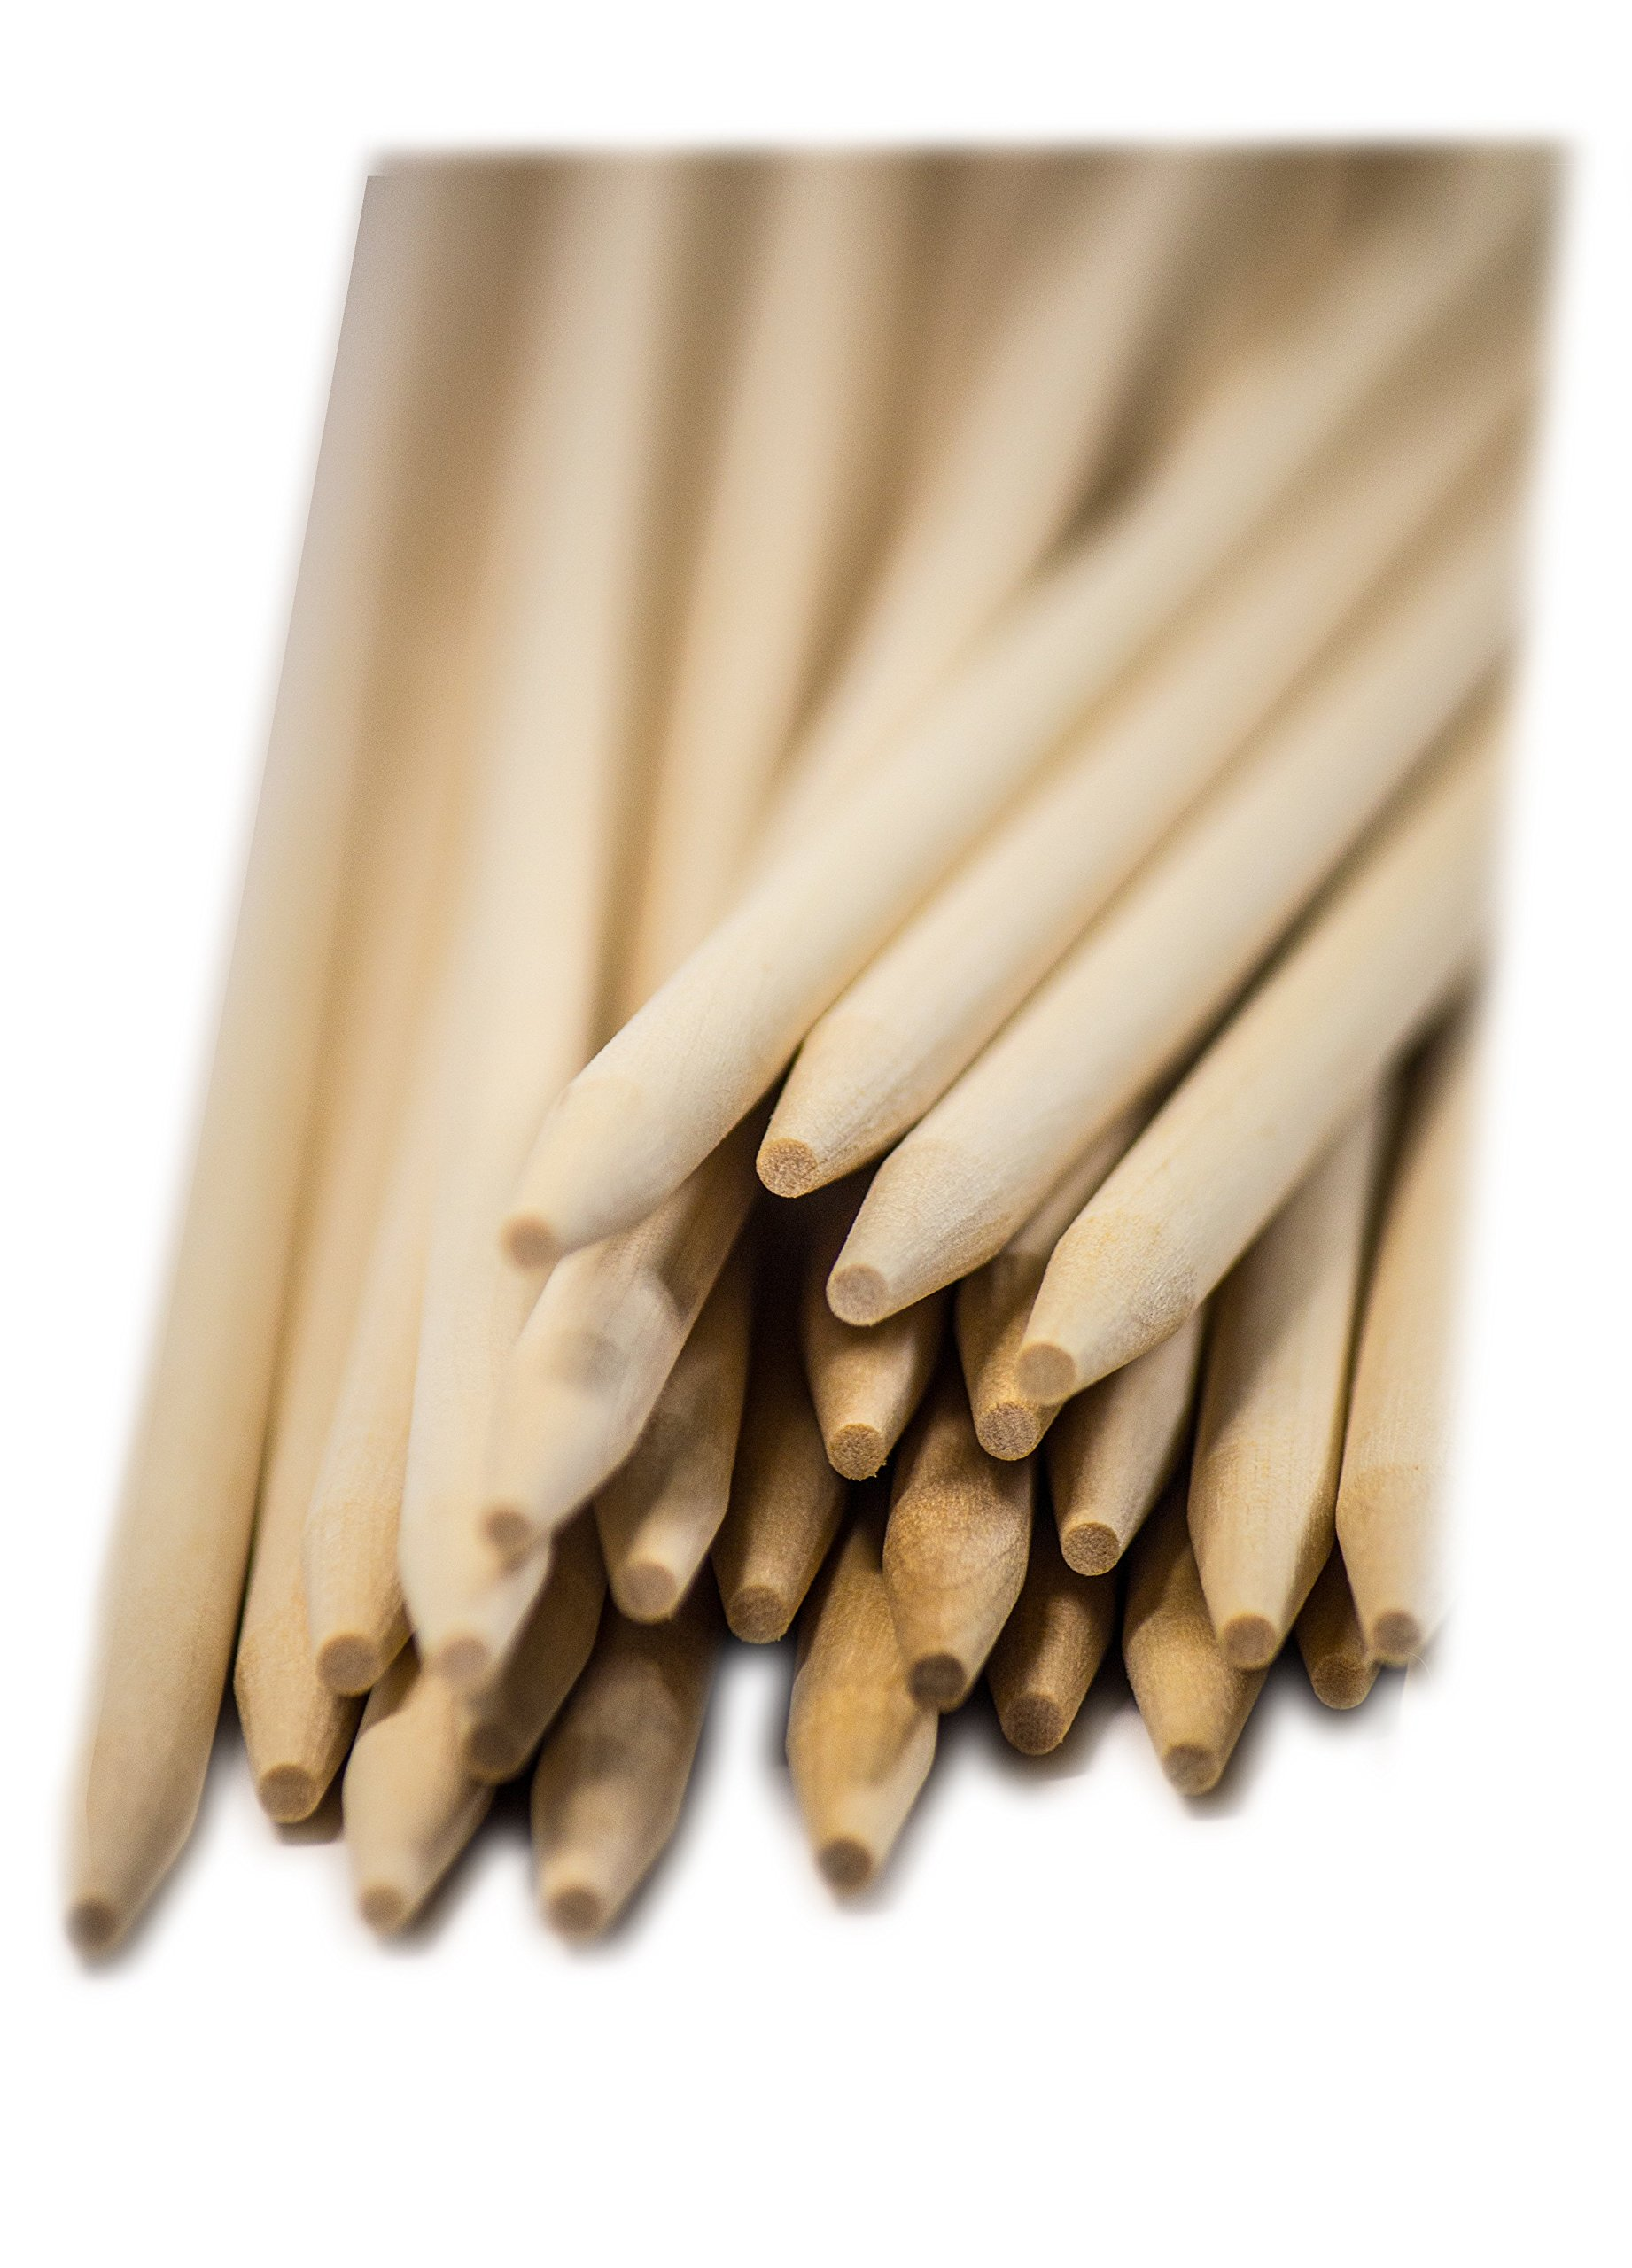 Perfect Stix Semi- Pointed Corn Dog Stick Skewers 8.5'' x 3/16'' ( pack of 5000) by Perfect Stix